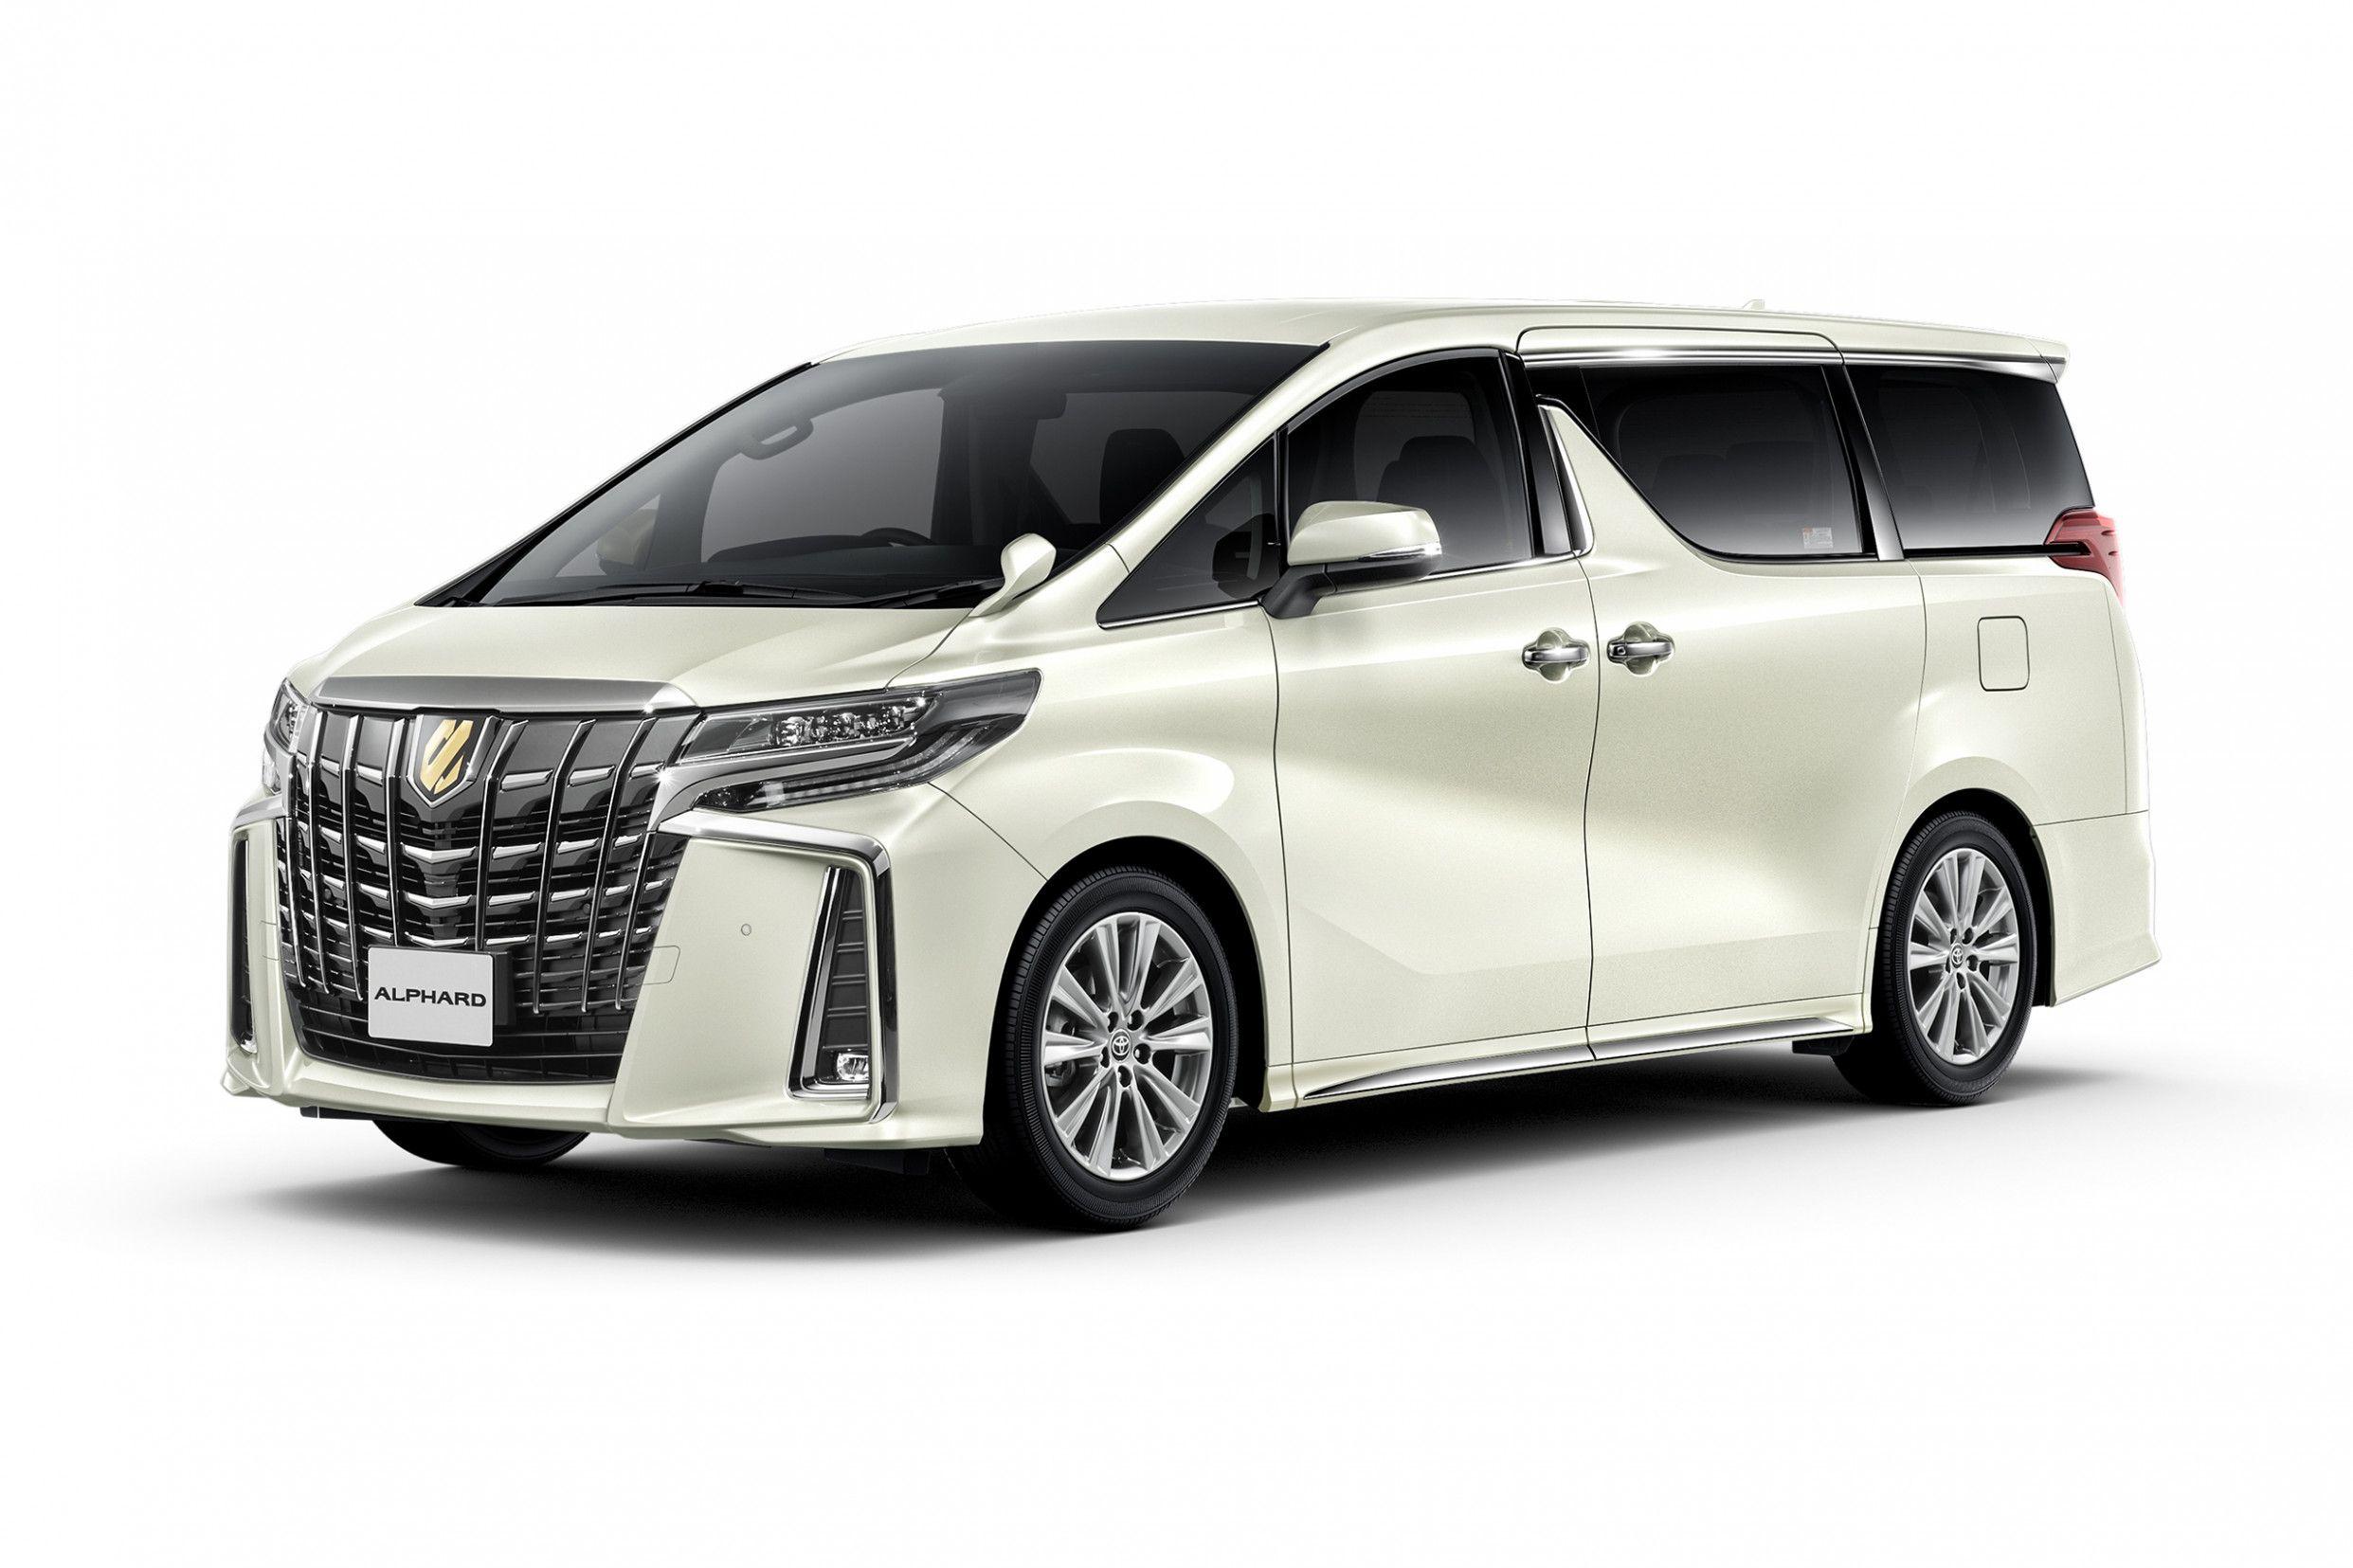 Konzept Und Konfiguration 2020 Toyota Alphard Barang Koleksi Mobil